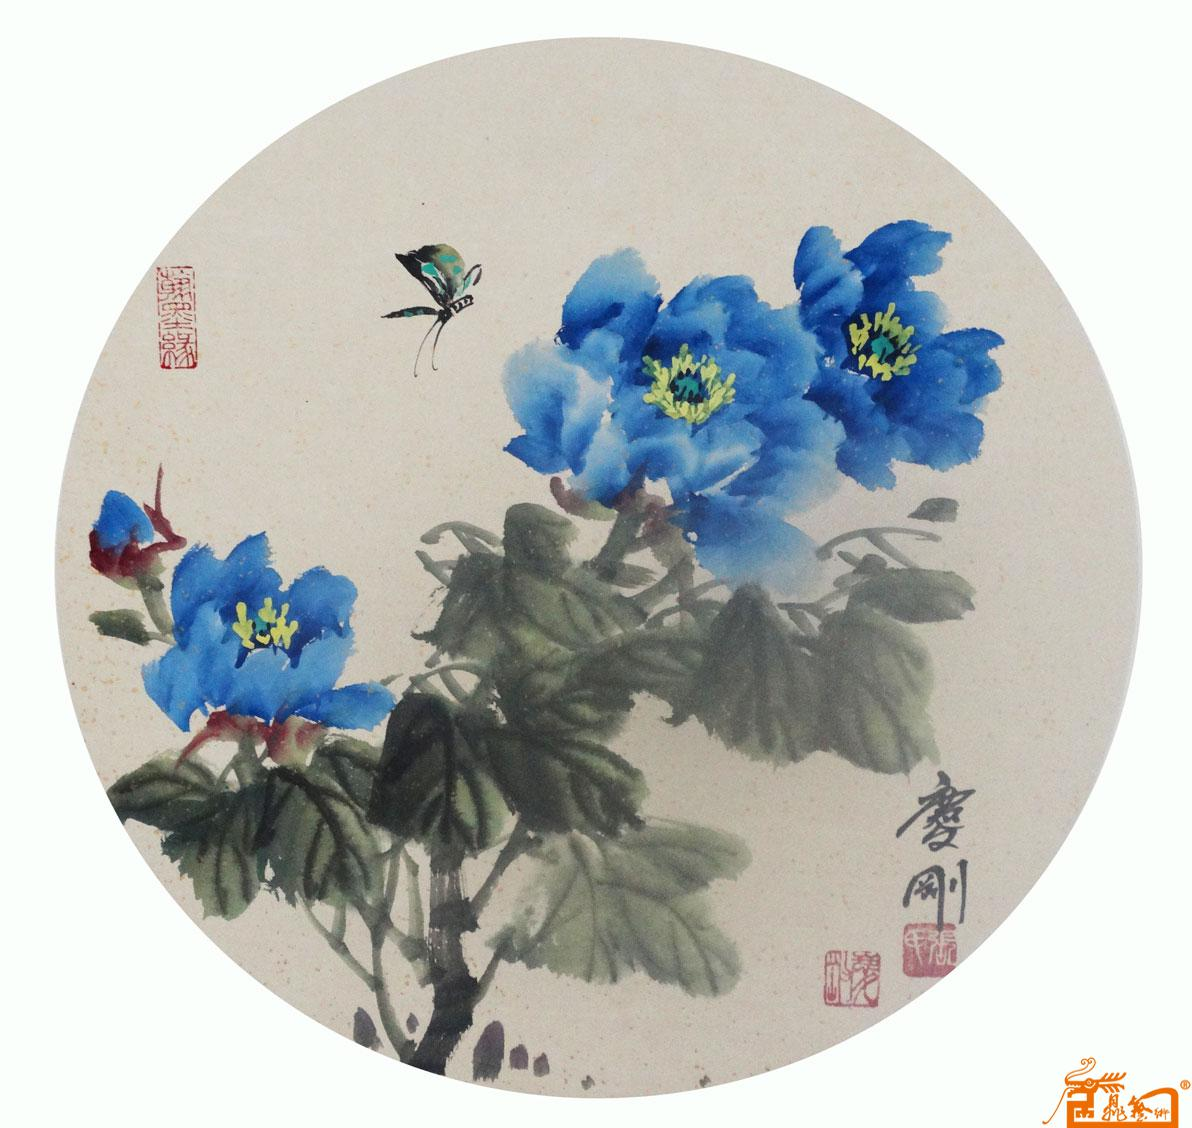 儿童手绘花朵团扇